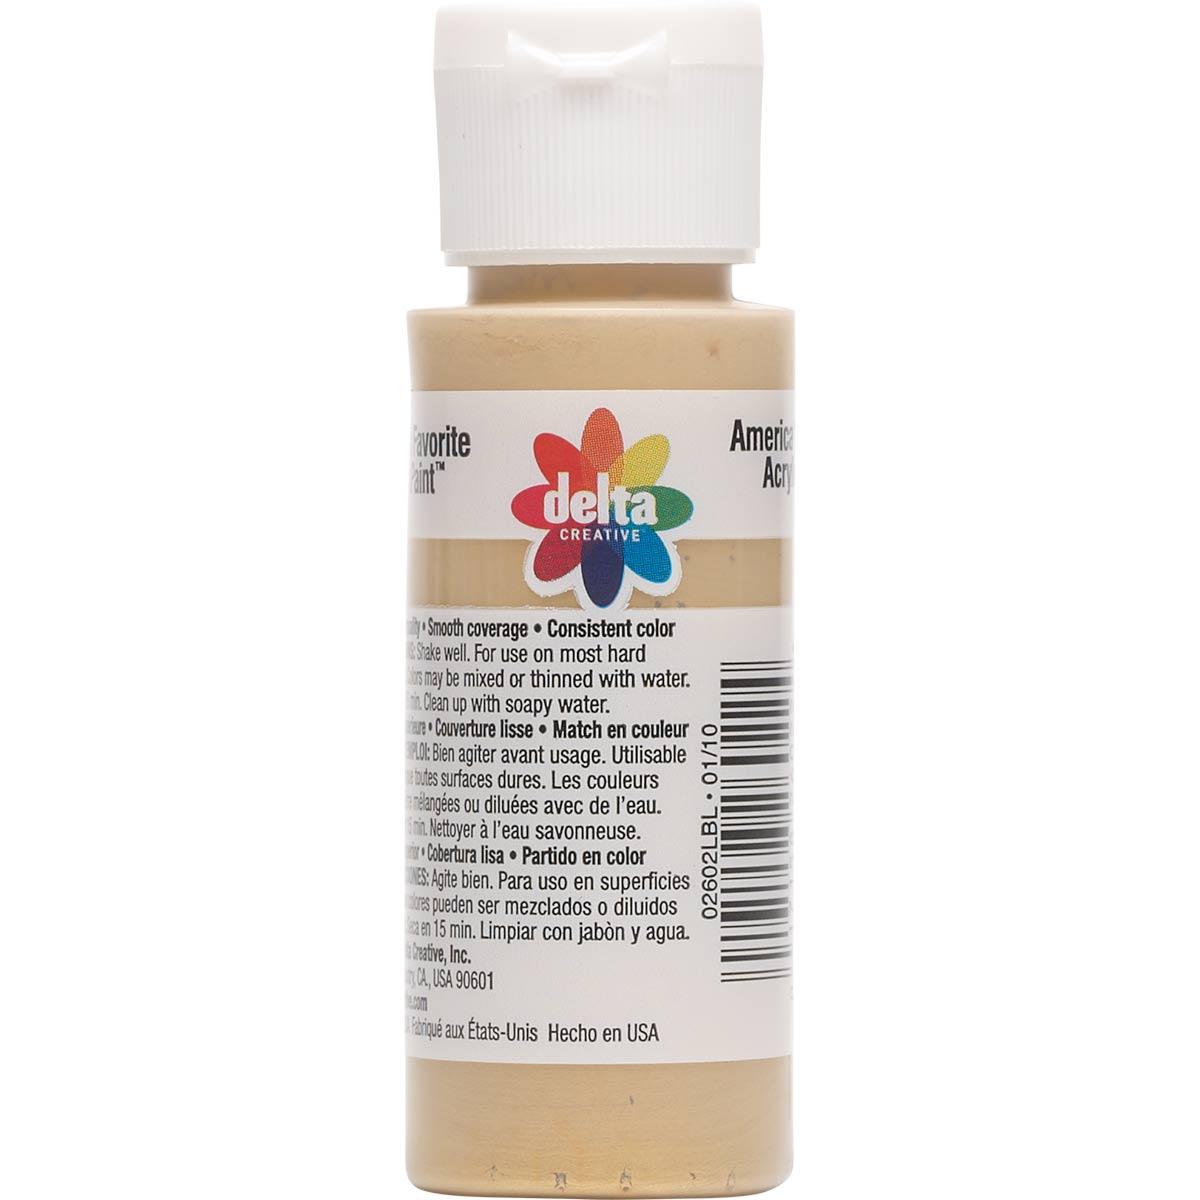 Delta Ceramcoat ® Acrylic Paint - Metallic Kim Gold, 2 oz. - 026020202W